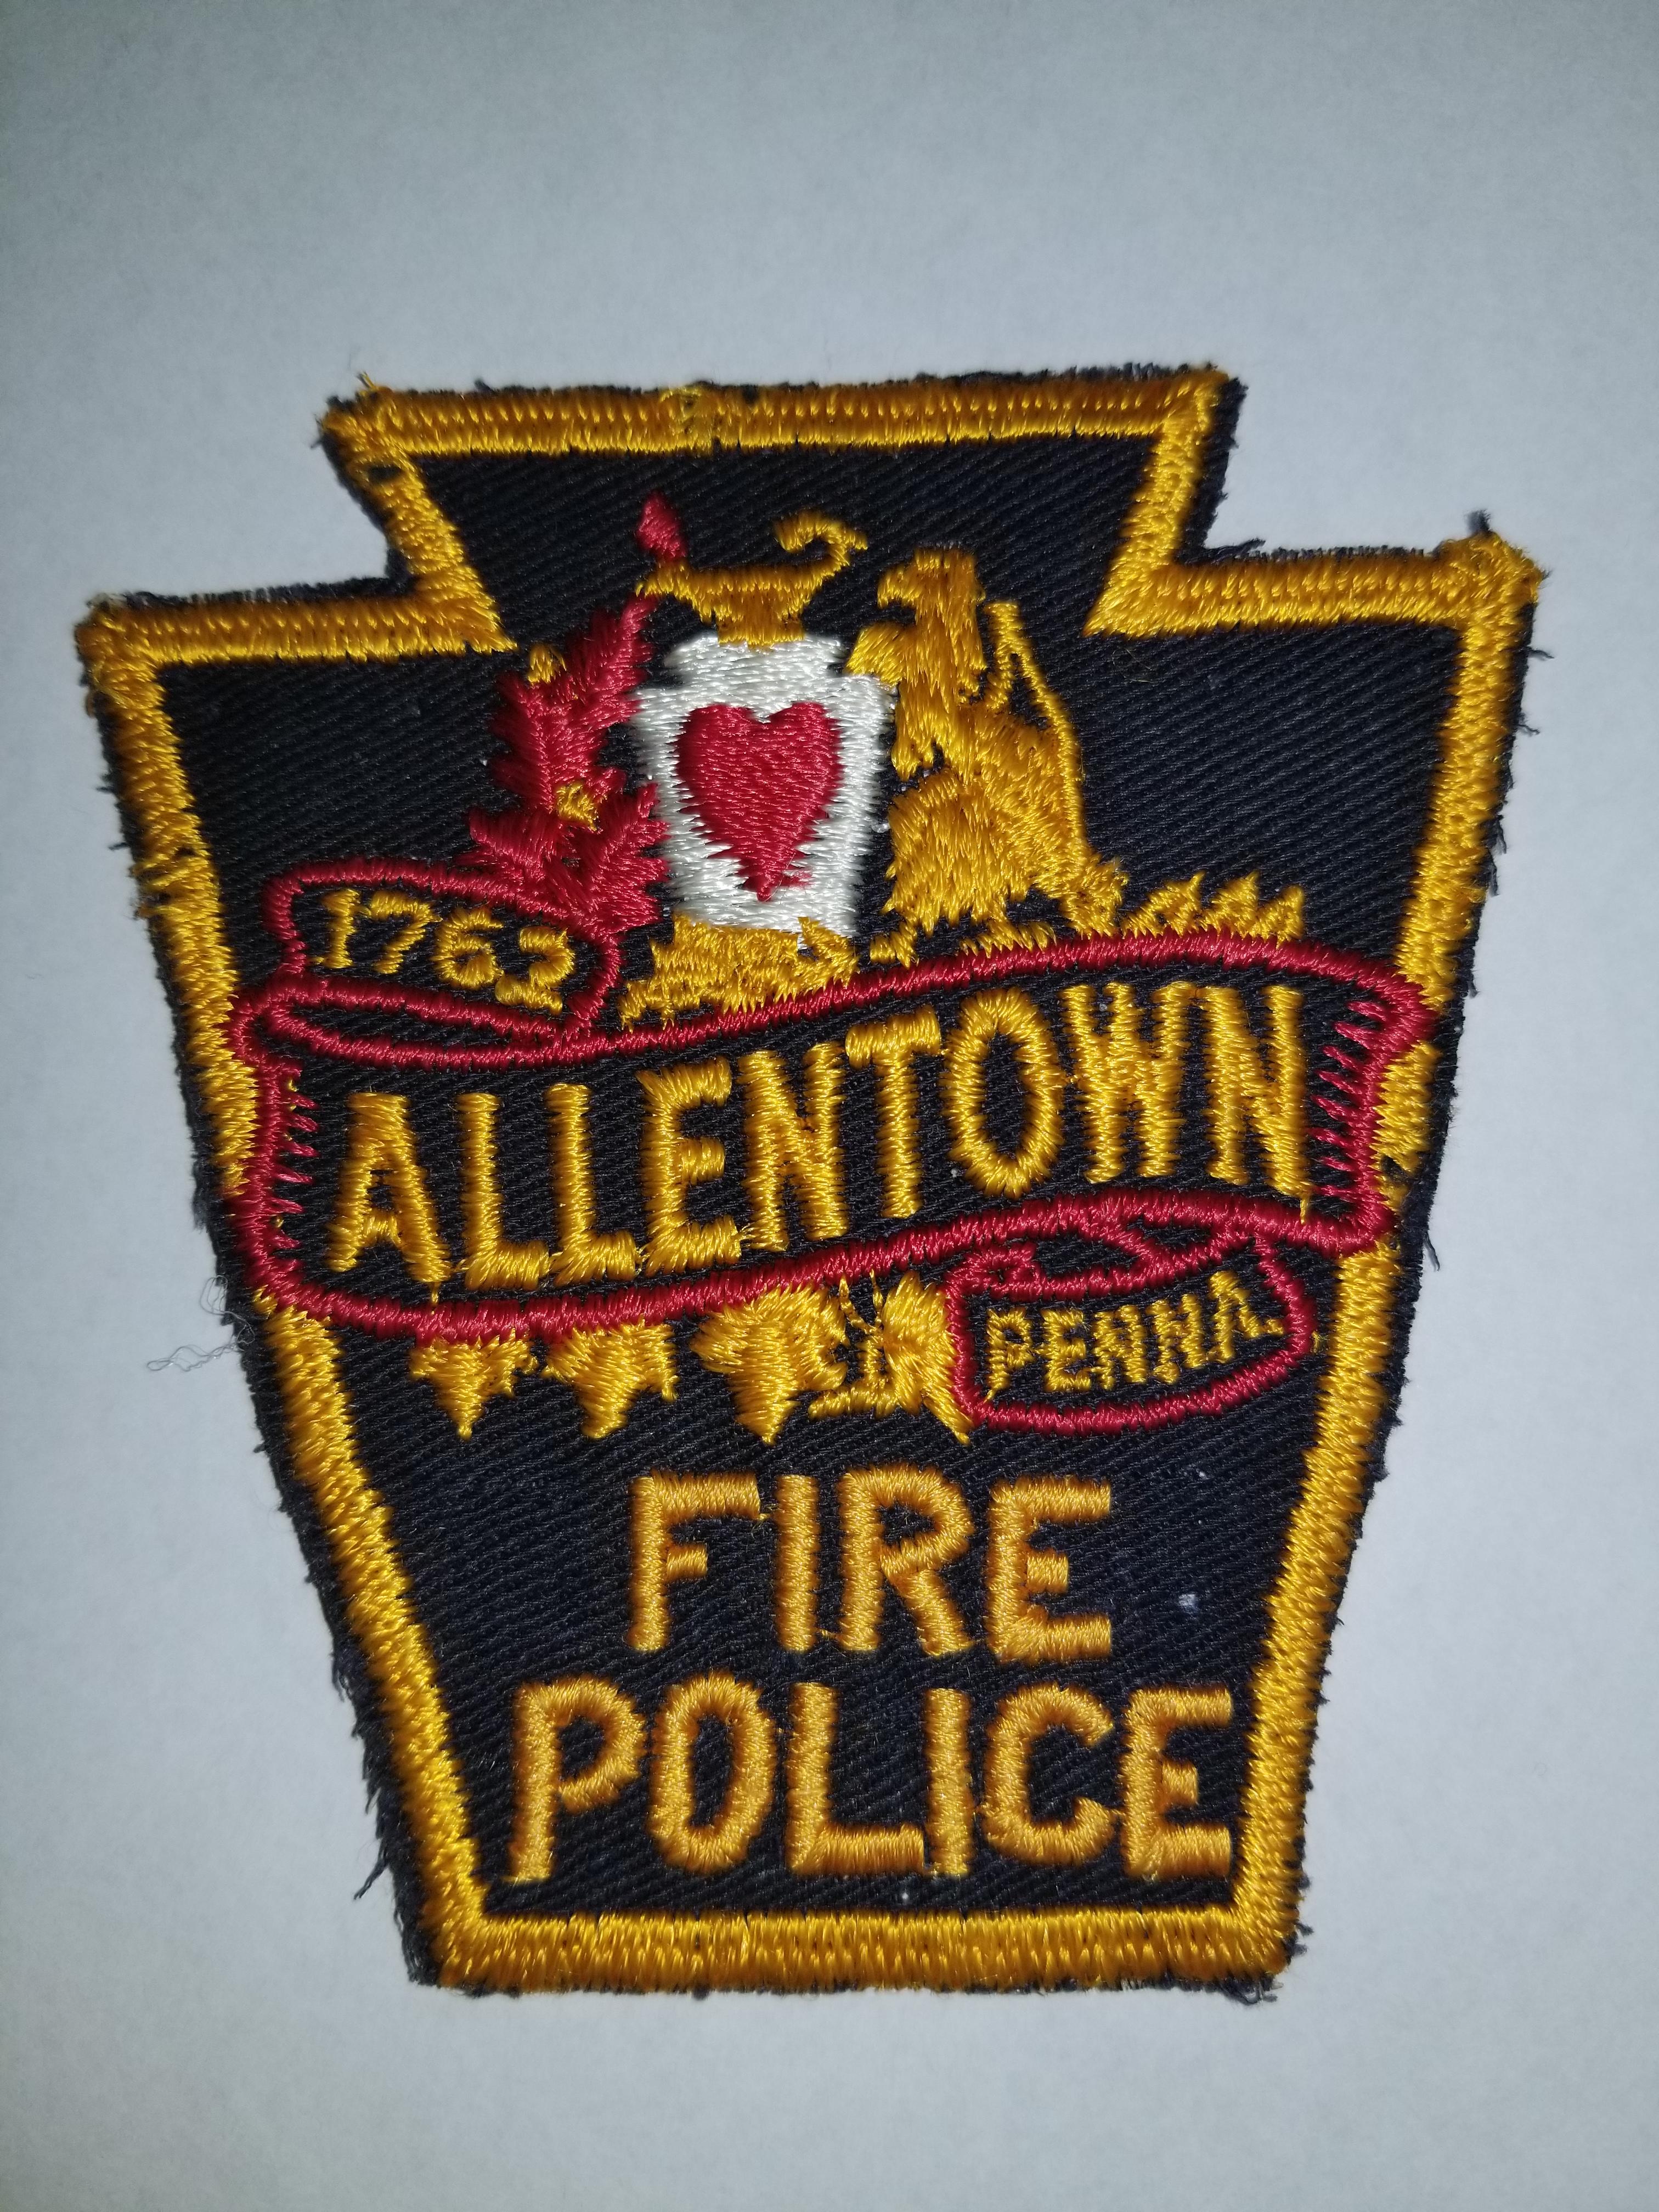 Allentown PA Fire Police